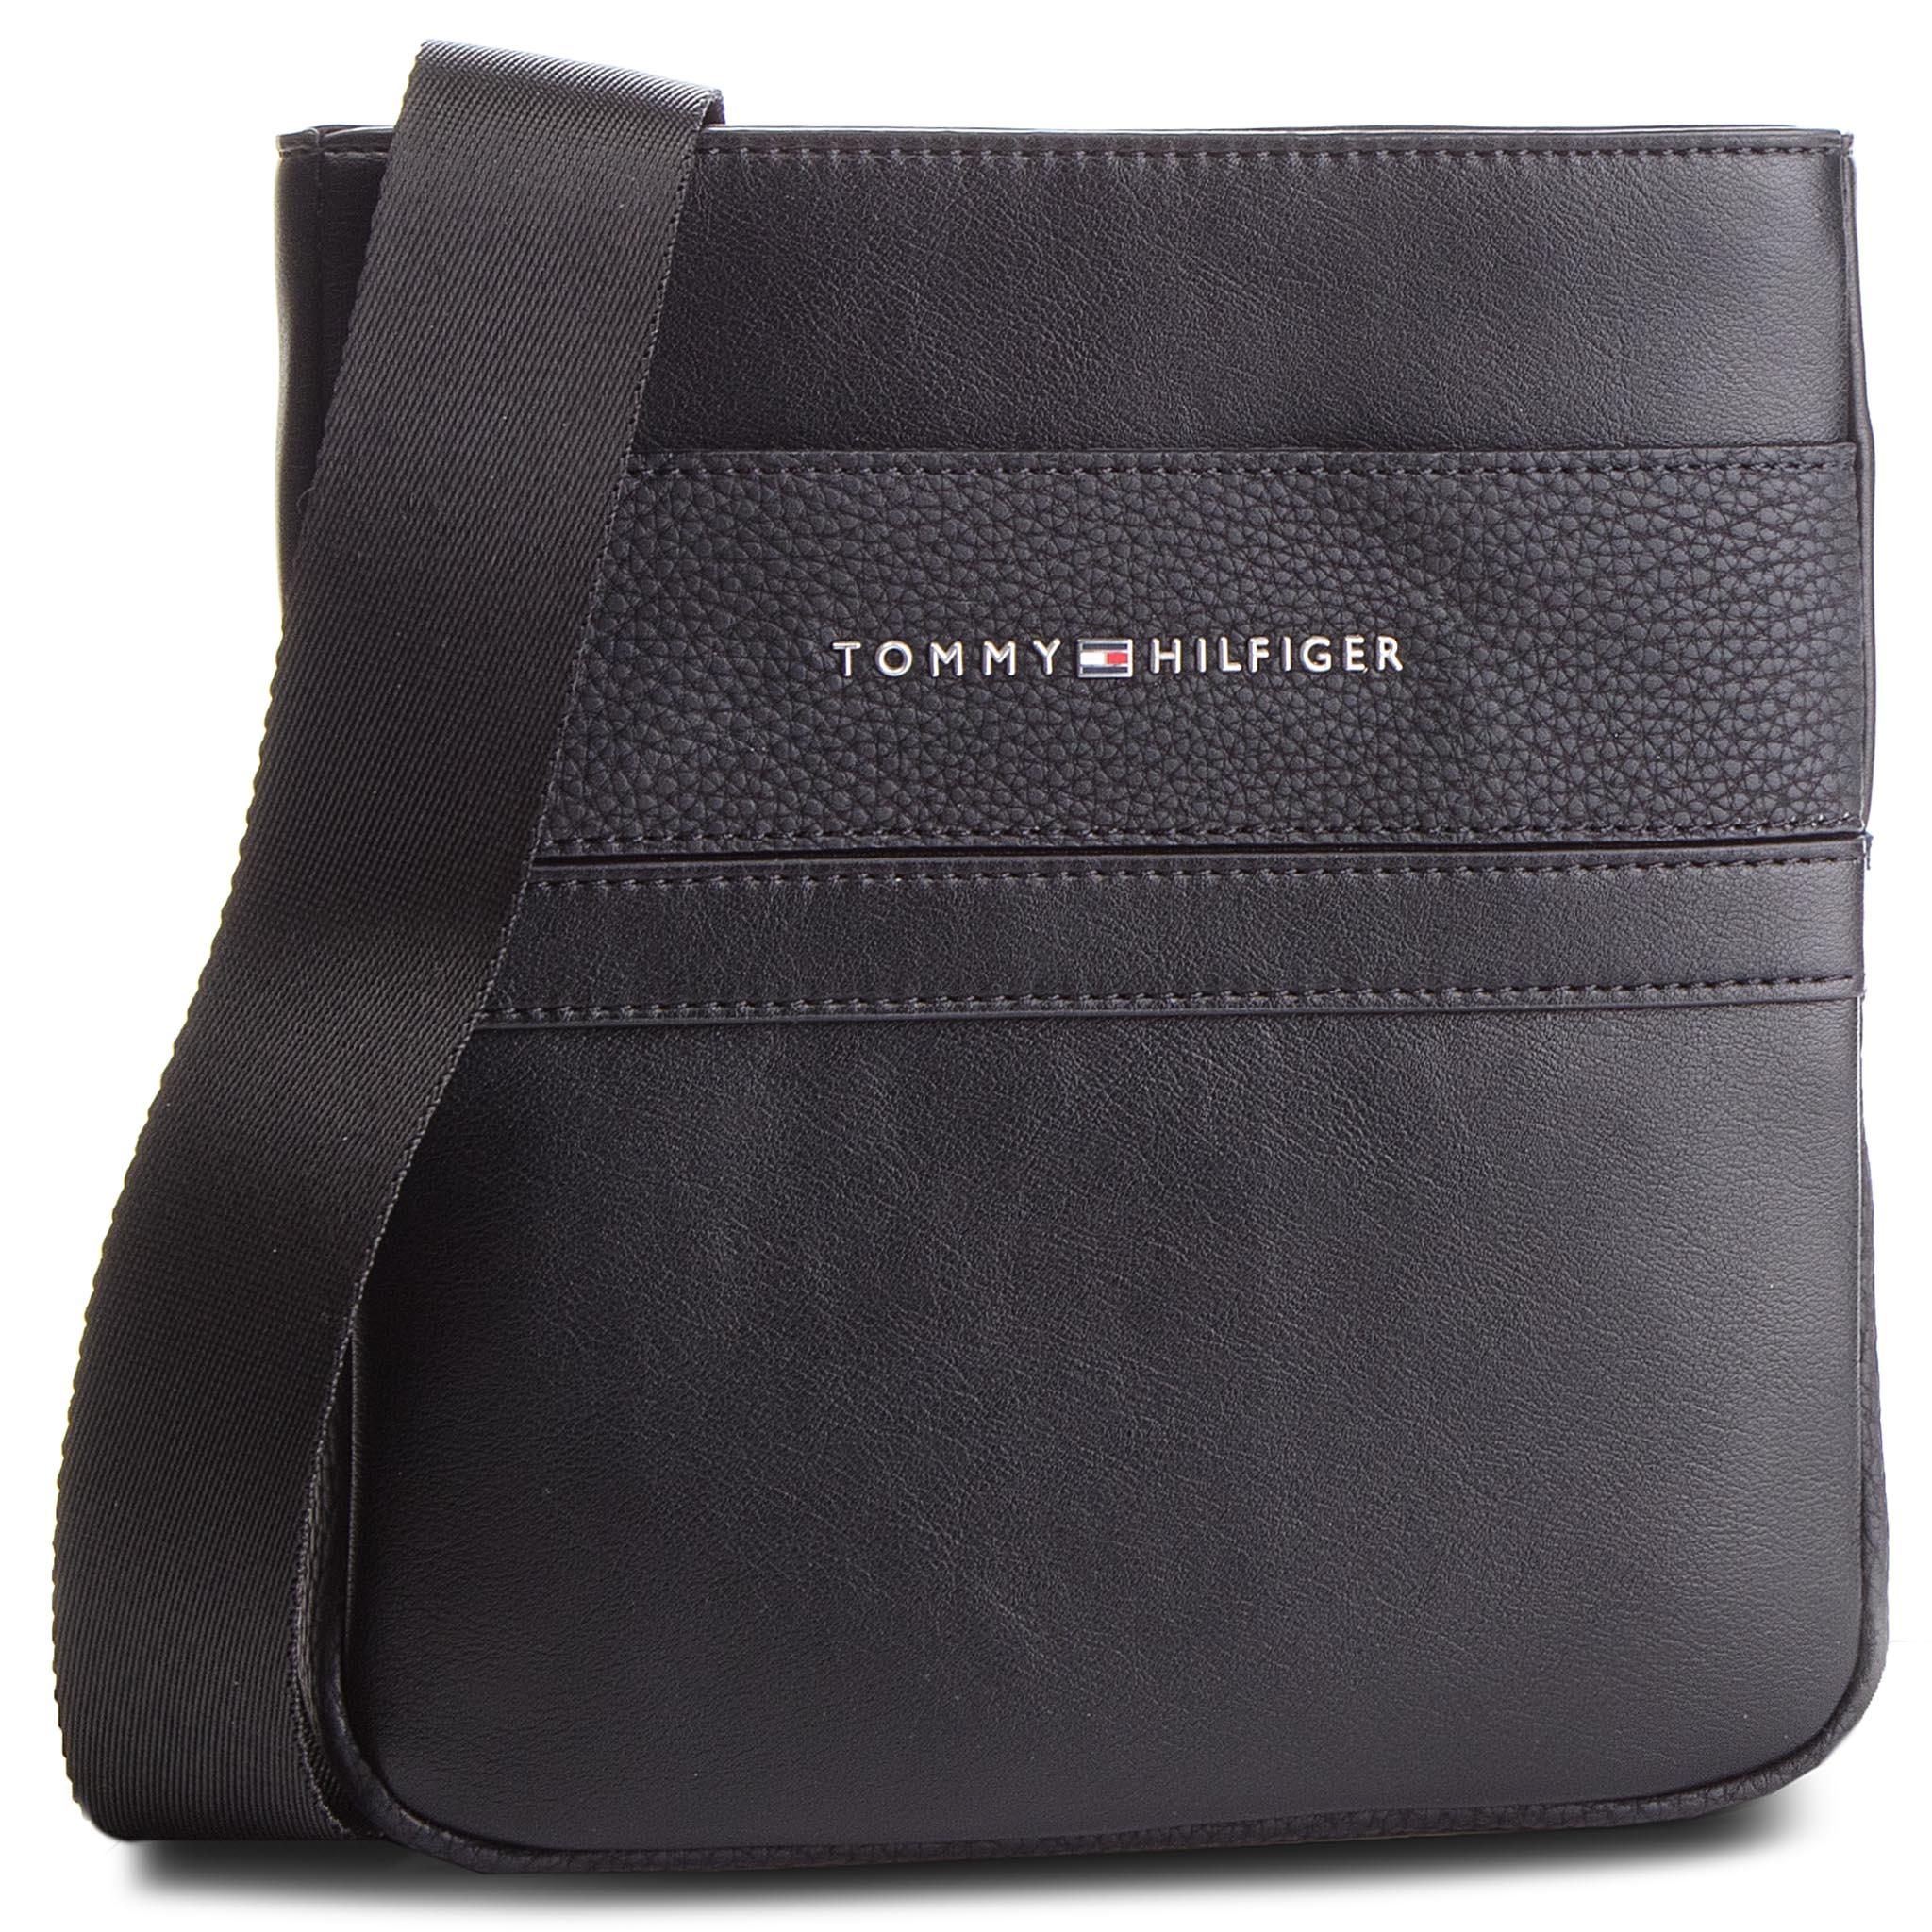 Válltáska TOMMY HILFIGER - Th Business Mini Crossover AM0AM04255 002 ... 04f6153020